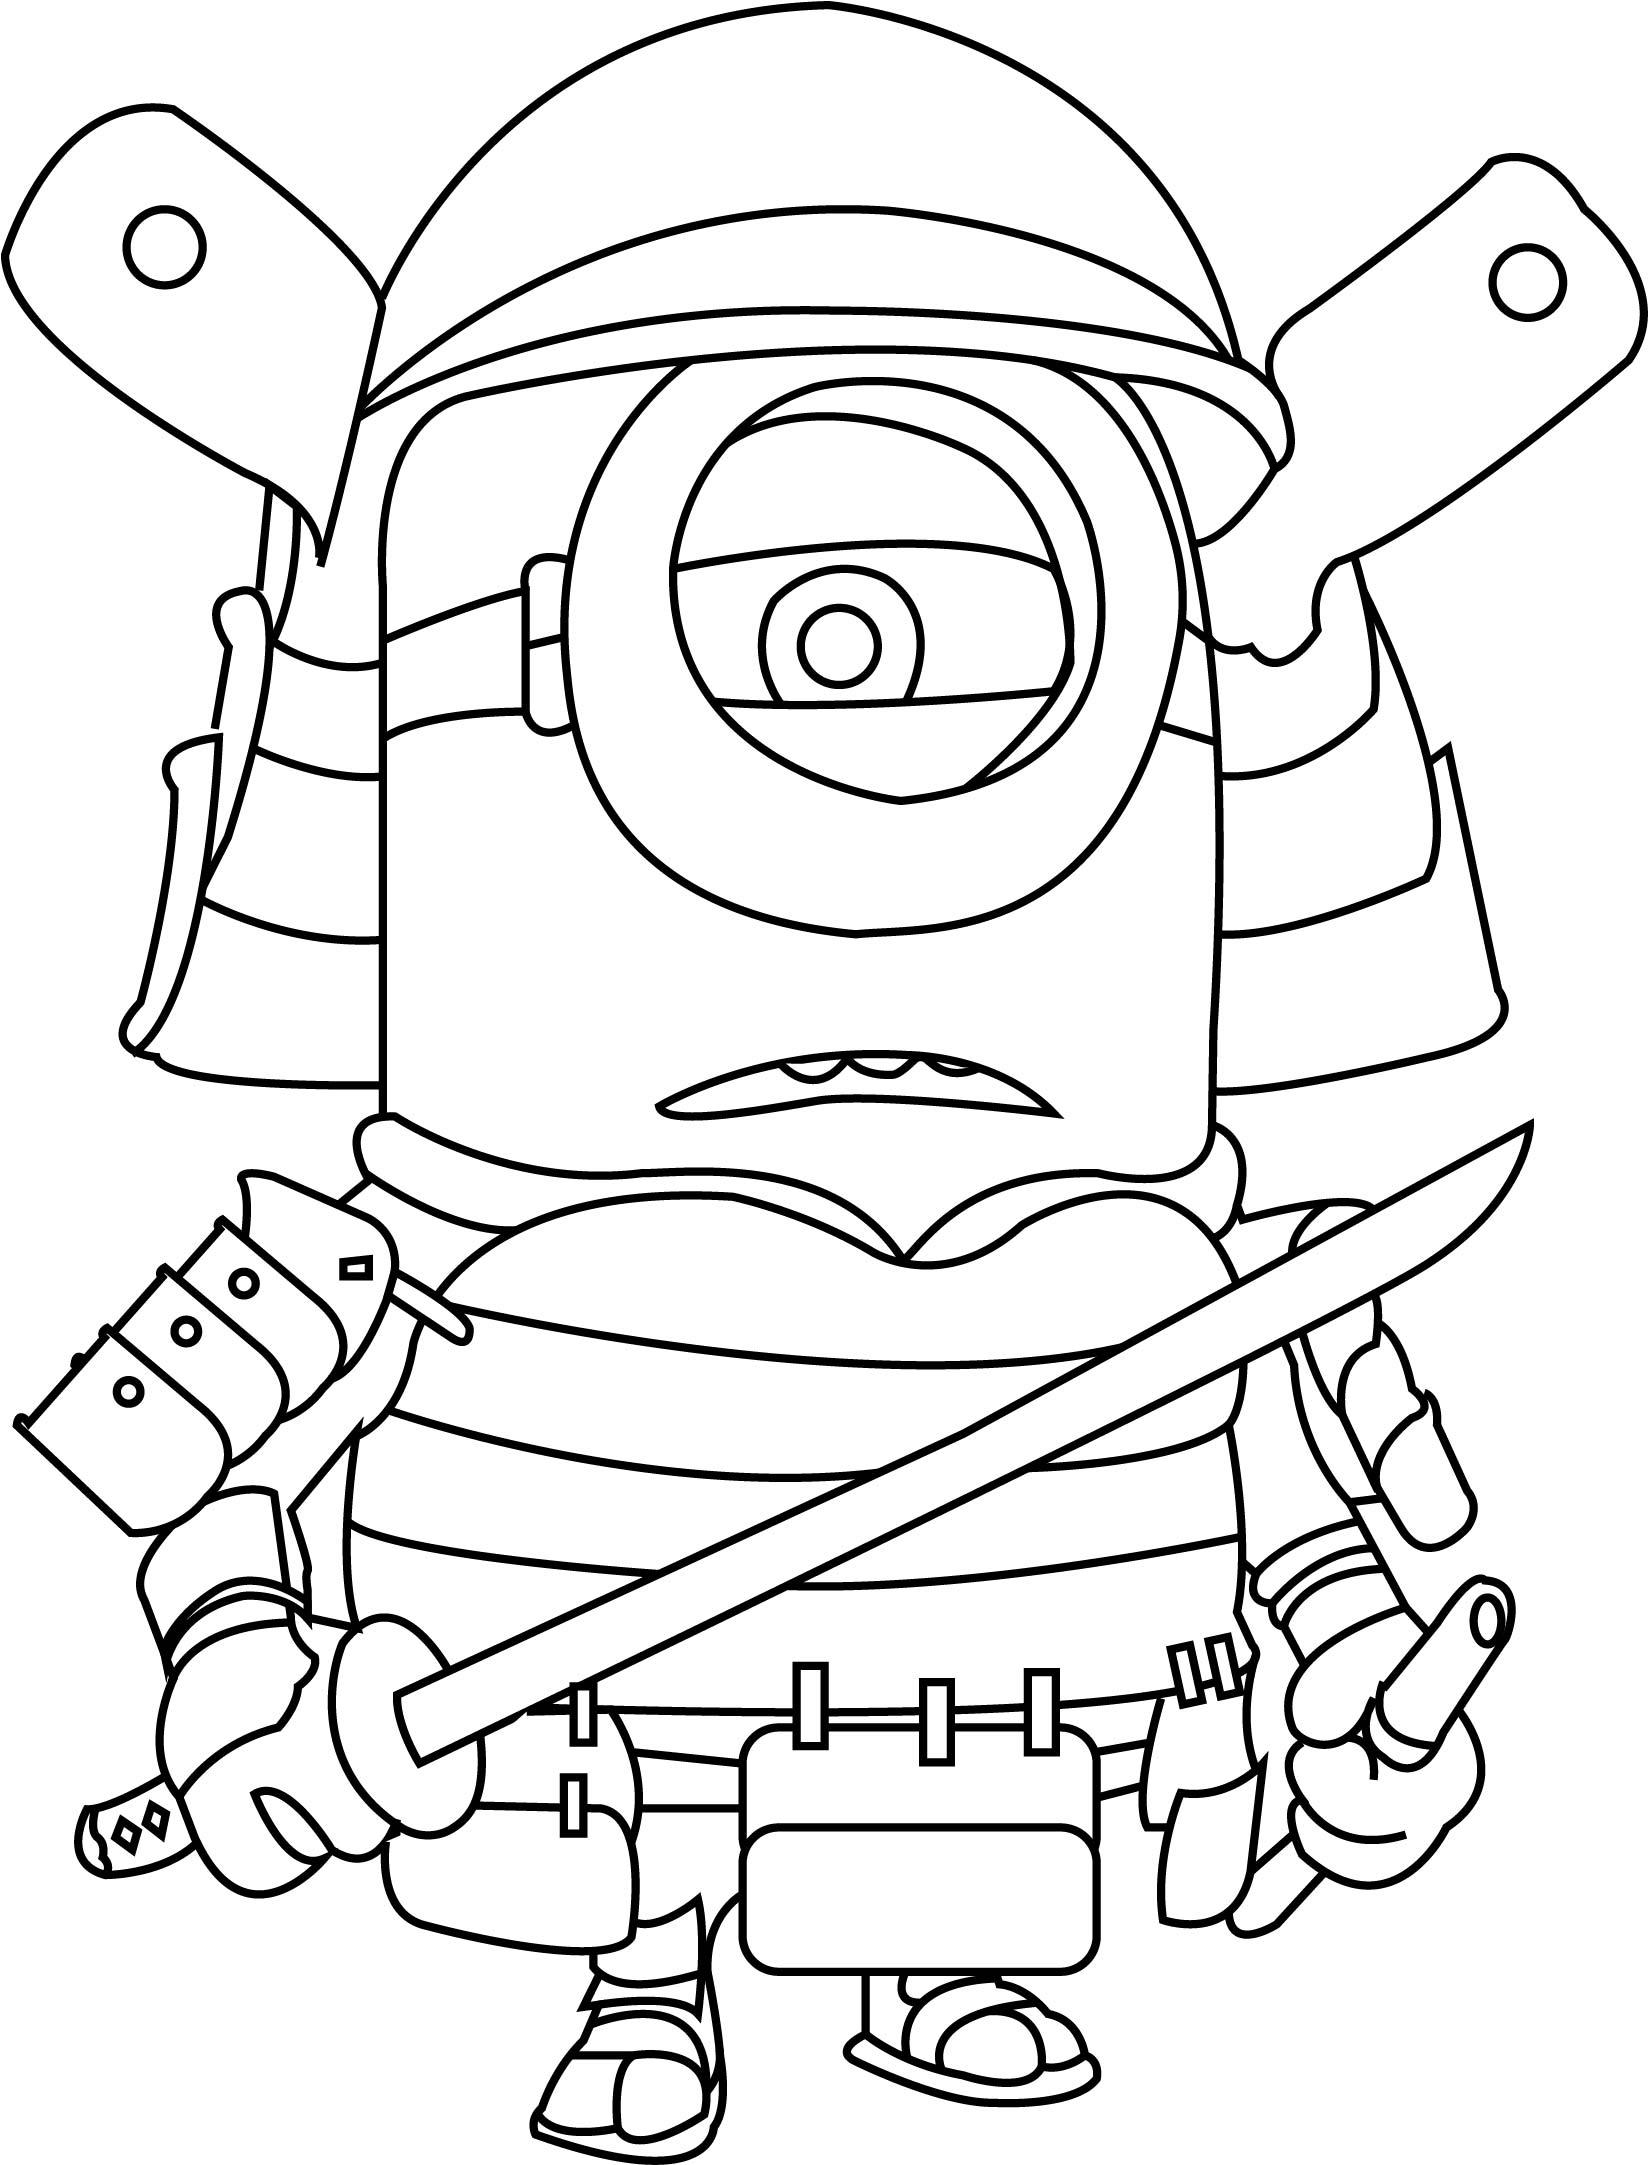 Samurai minions coloring page for Katana coloring page